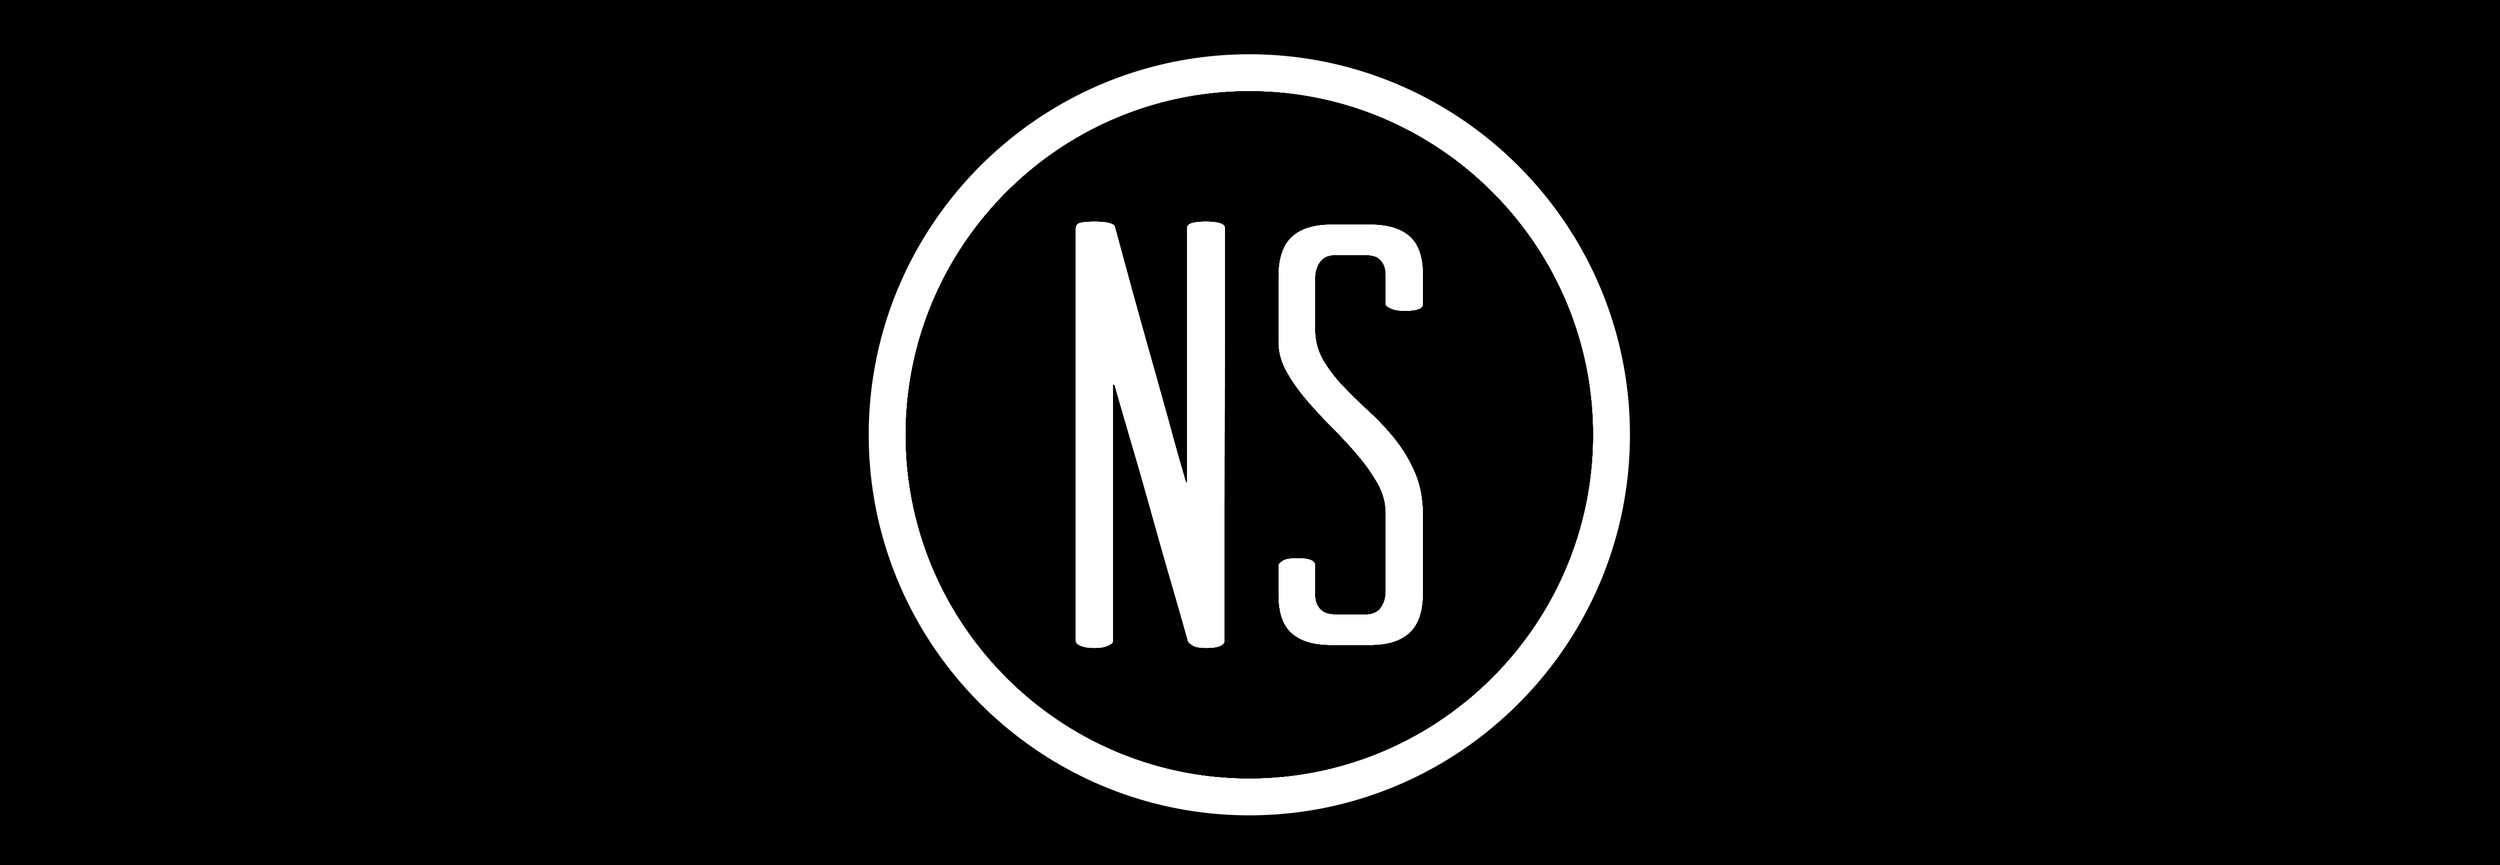 nick_newlogo9.jpg